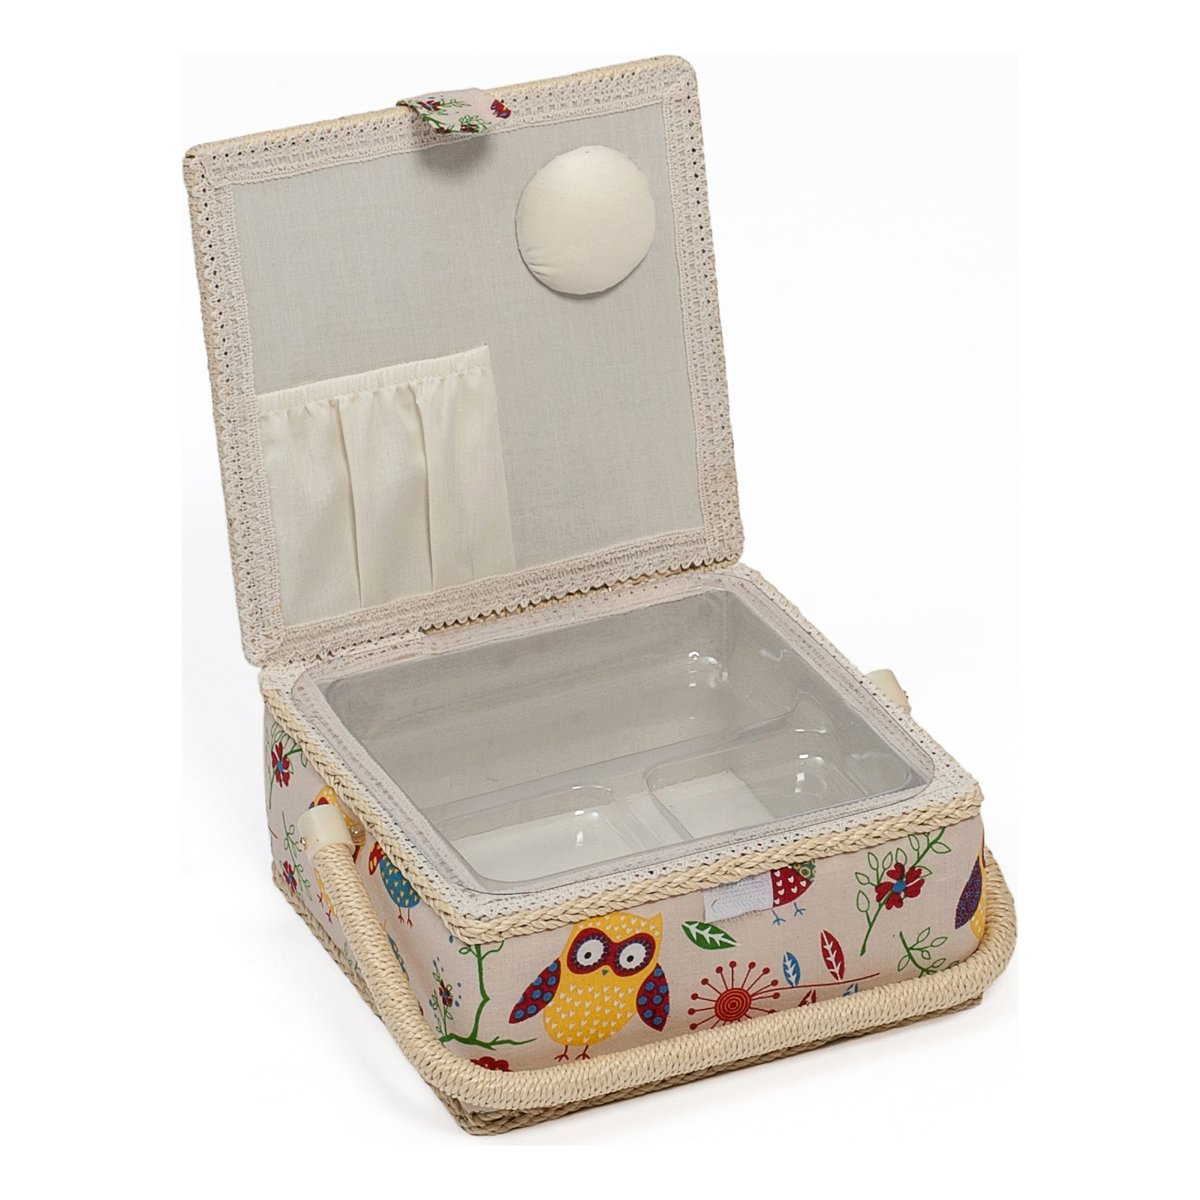 Amazon.com Hobby Gift Owl Design Sewing Box on Natural Small (20 x 20 x 11cm)  sc 1 st  Amazon.com & Amazon.com: Hobby Gift Owl Design Sewing Box on Natural Small (20 ... Aboutintivar.Com